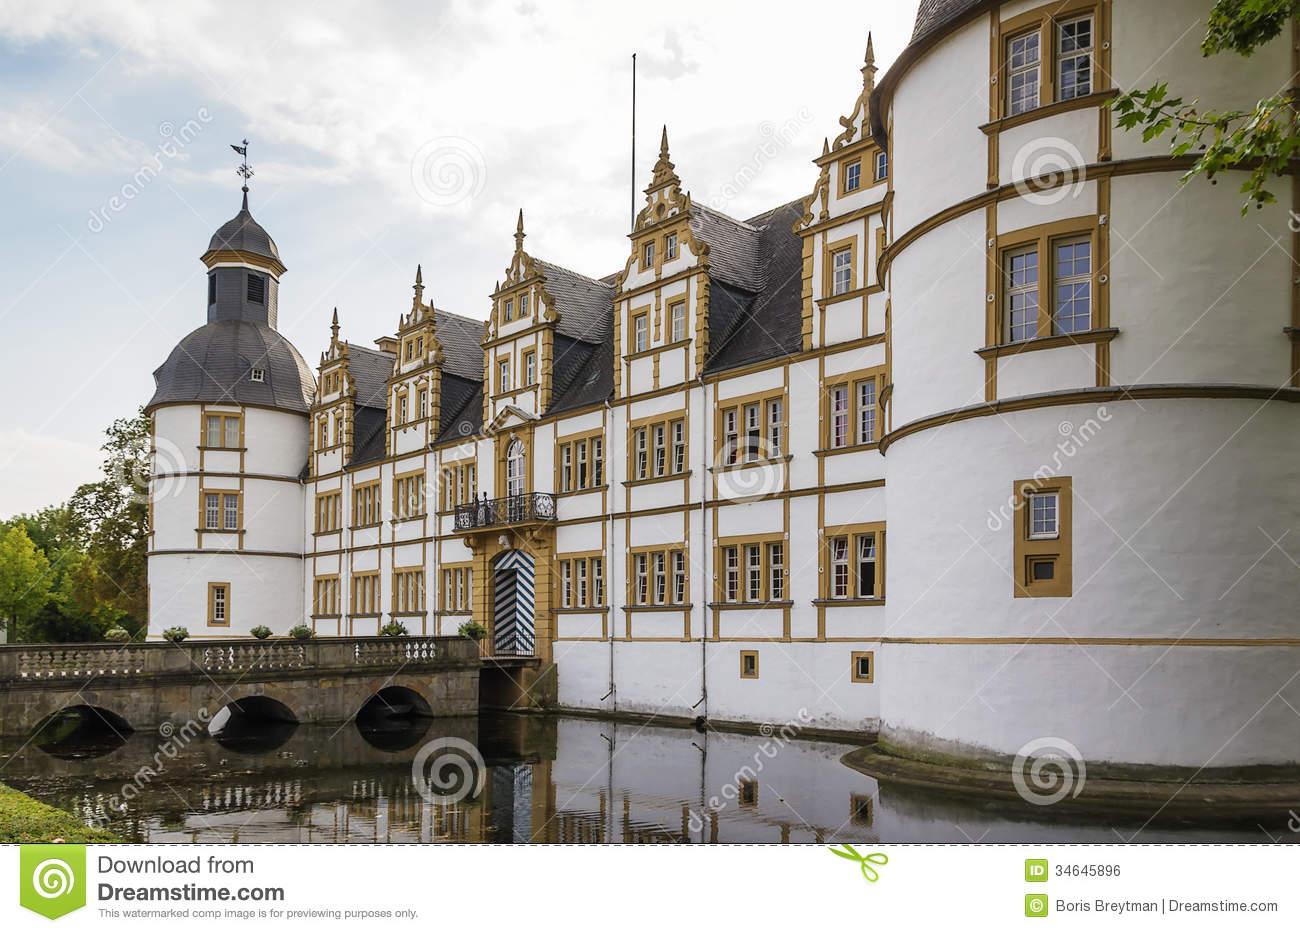 Neuhaus Castle In Paderborn, Germany Royalty Free Stock Image.